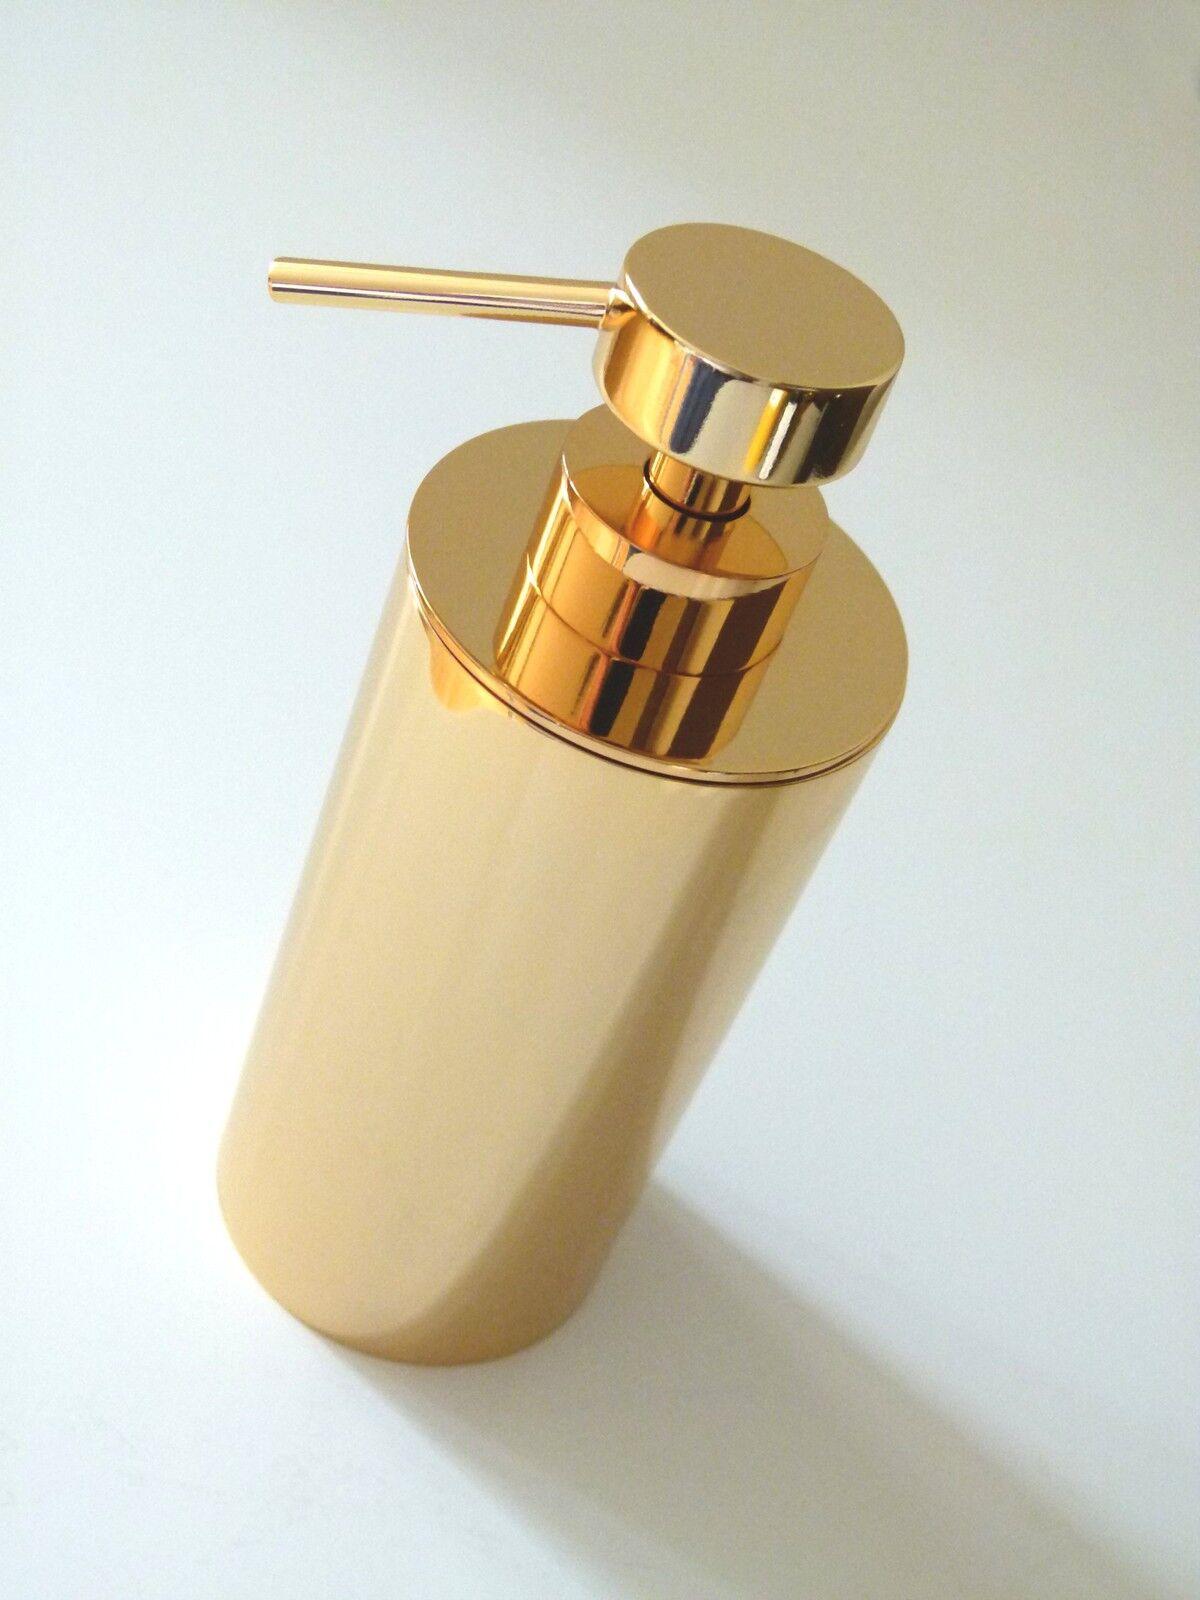 Sehr exklusiver Design Seifenspender, 24 Karat hart verGoldet, Gold